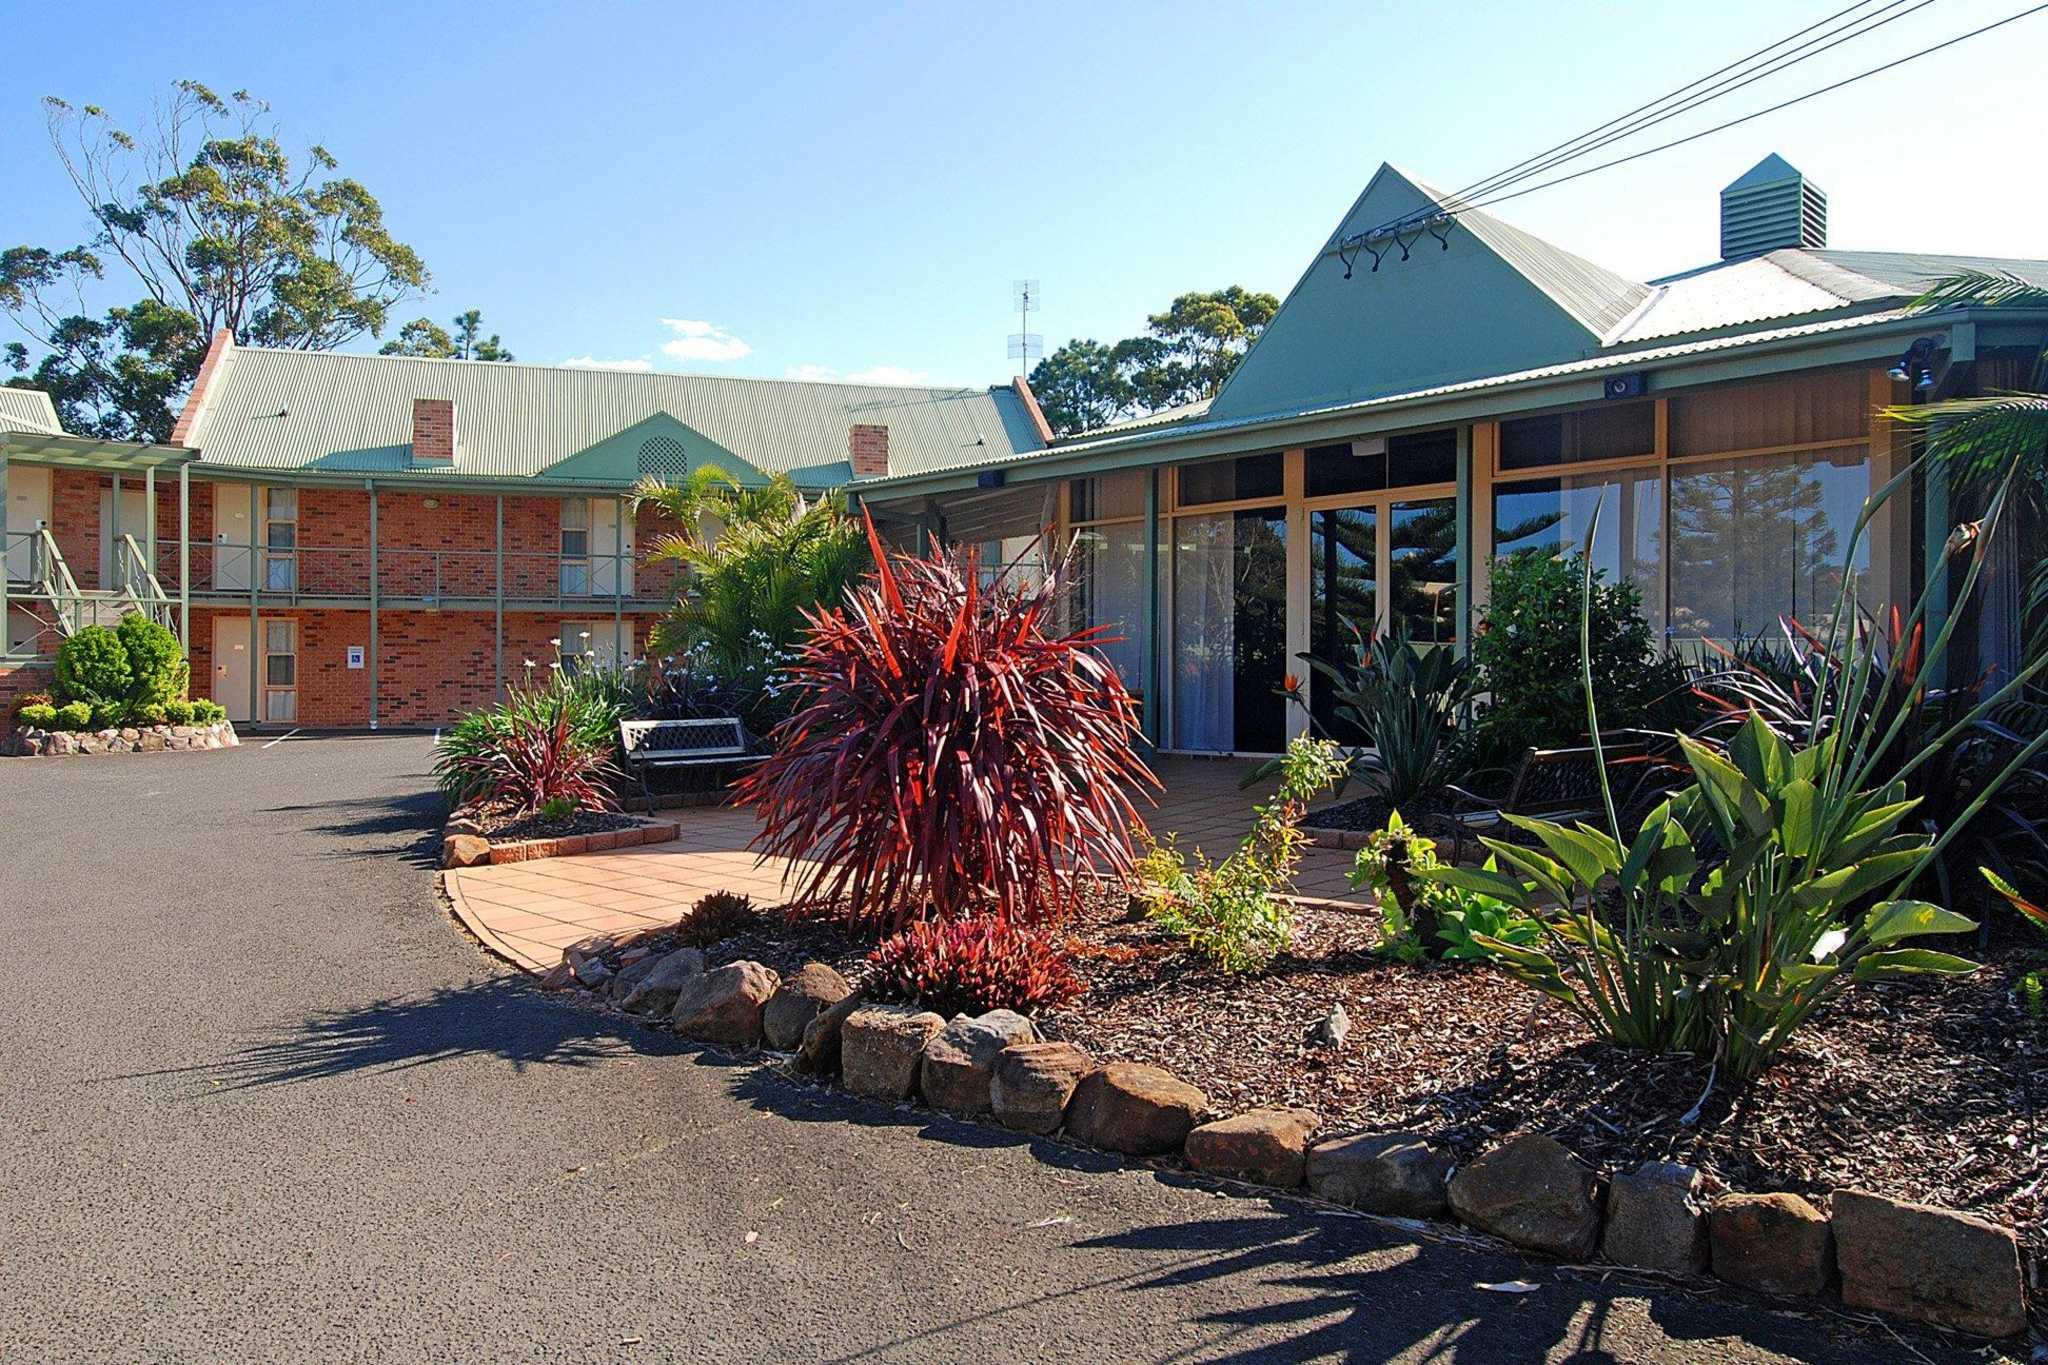 Comfort Inn Fairways - Primbee, NSW 2502 - (02) 4274 7274   ShowMeLocal.com